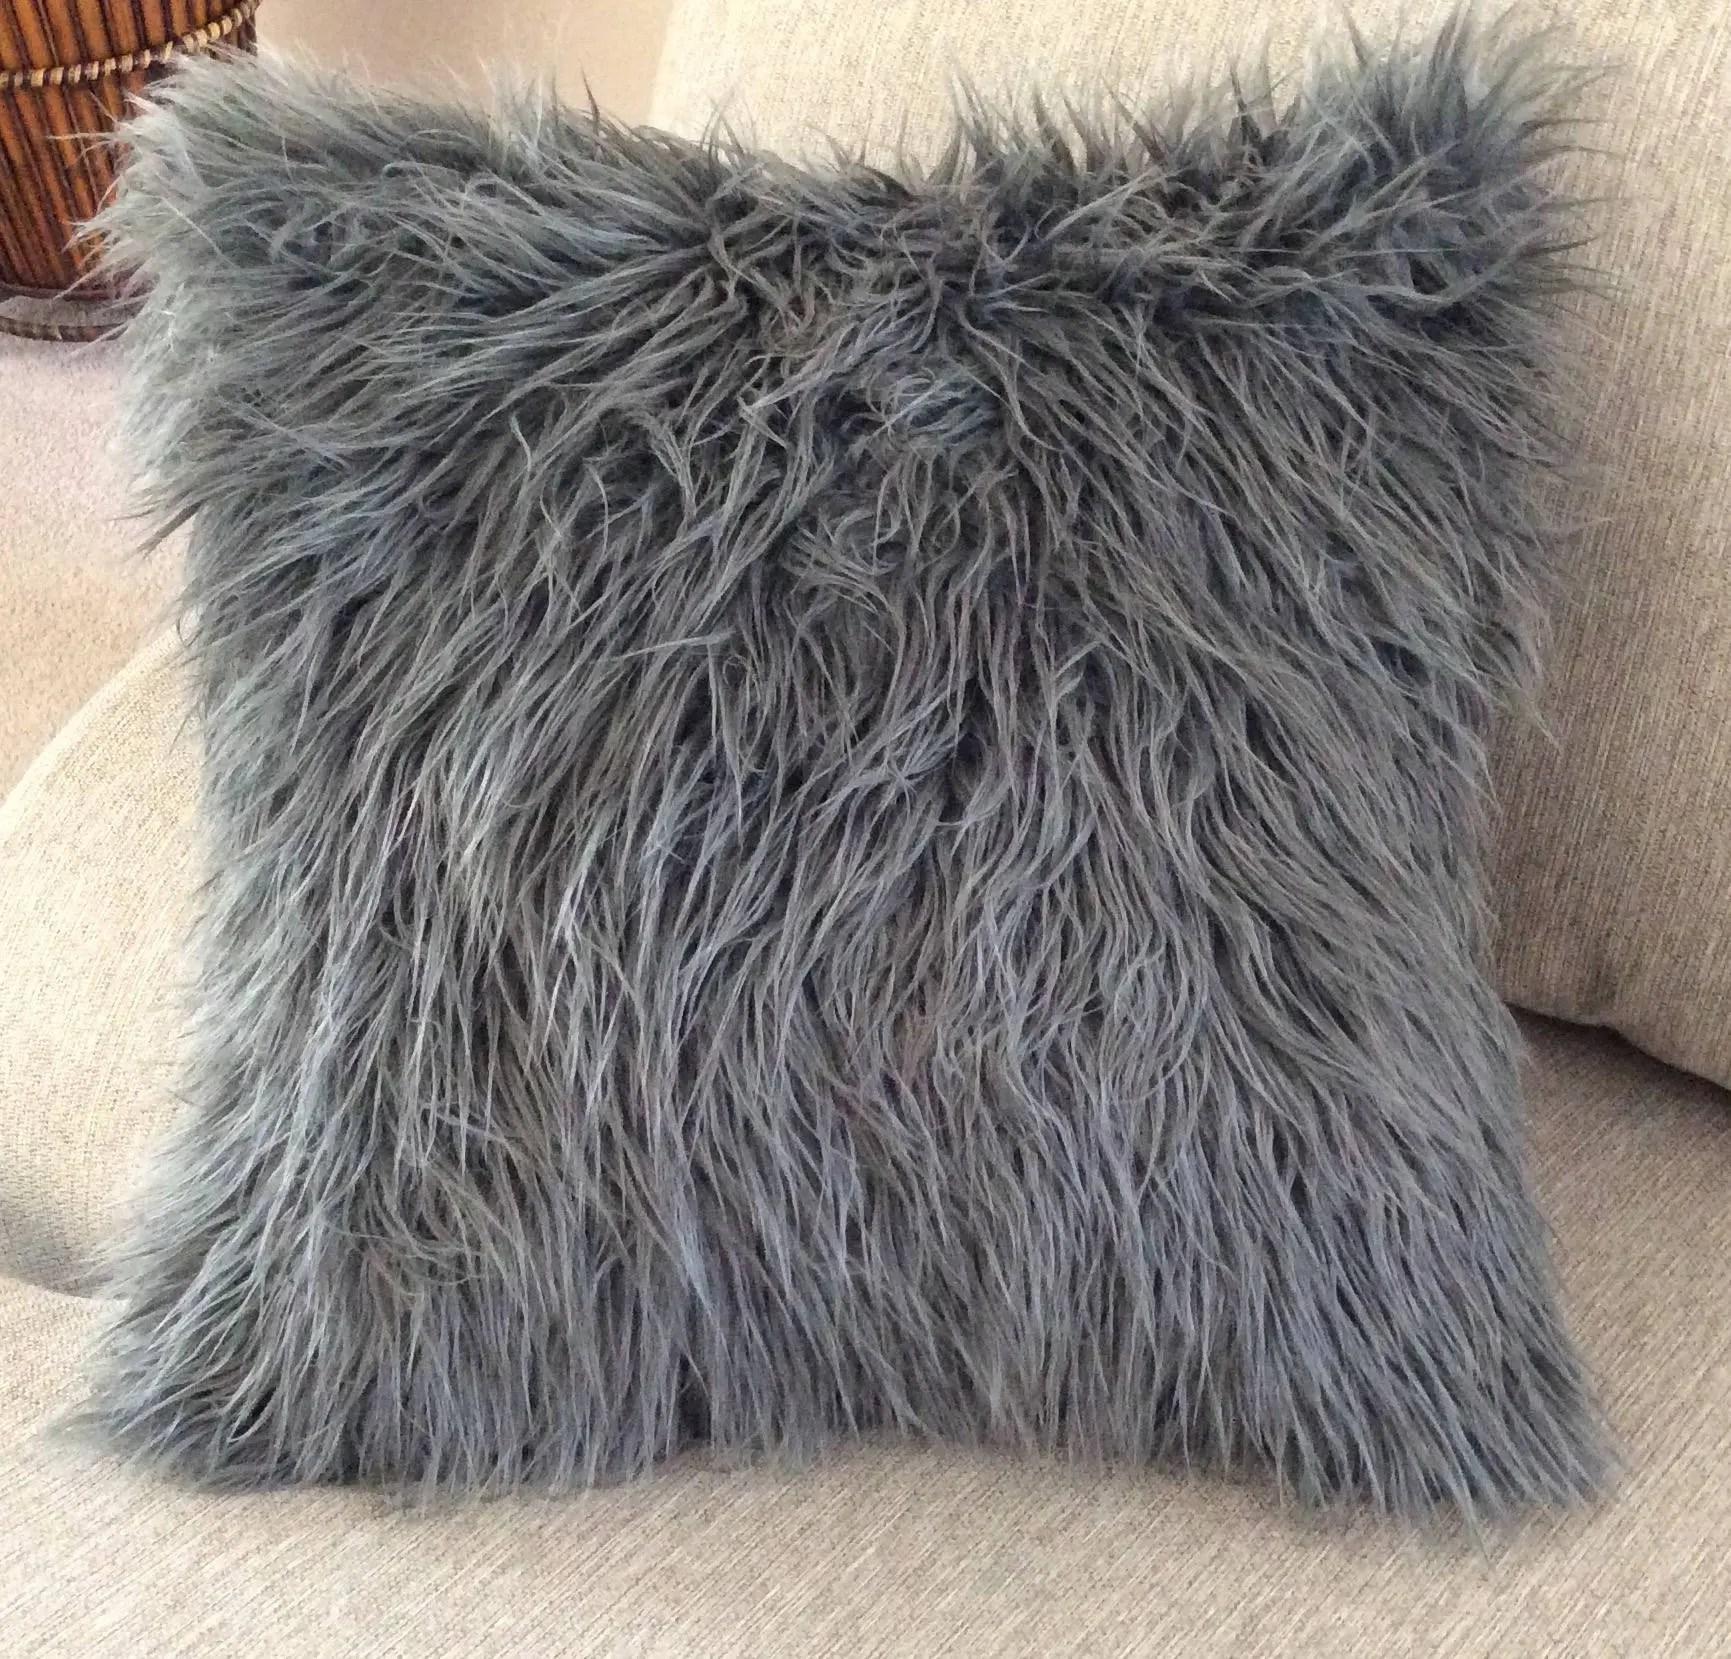 fur pillow gray fur pillow charcoal grey faux fur pillow pillow covers grey cushion covers fur 18x18 pillow gray fur pillow galorie